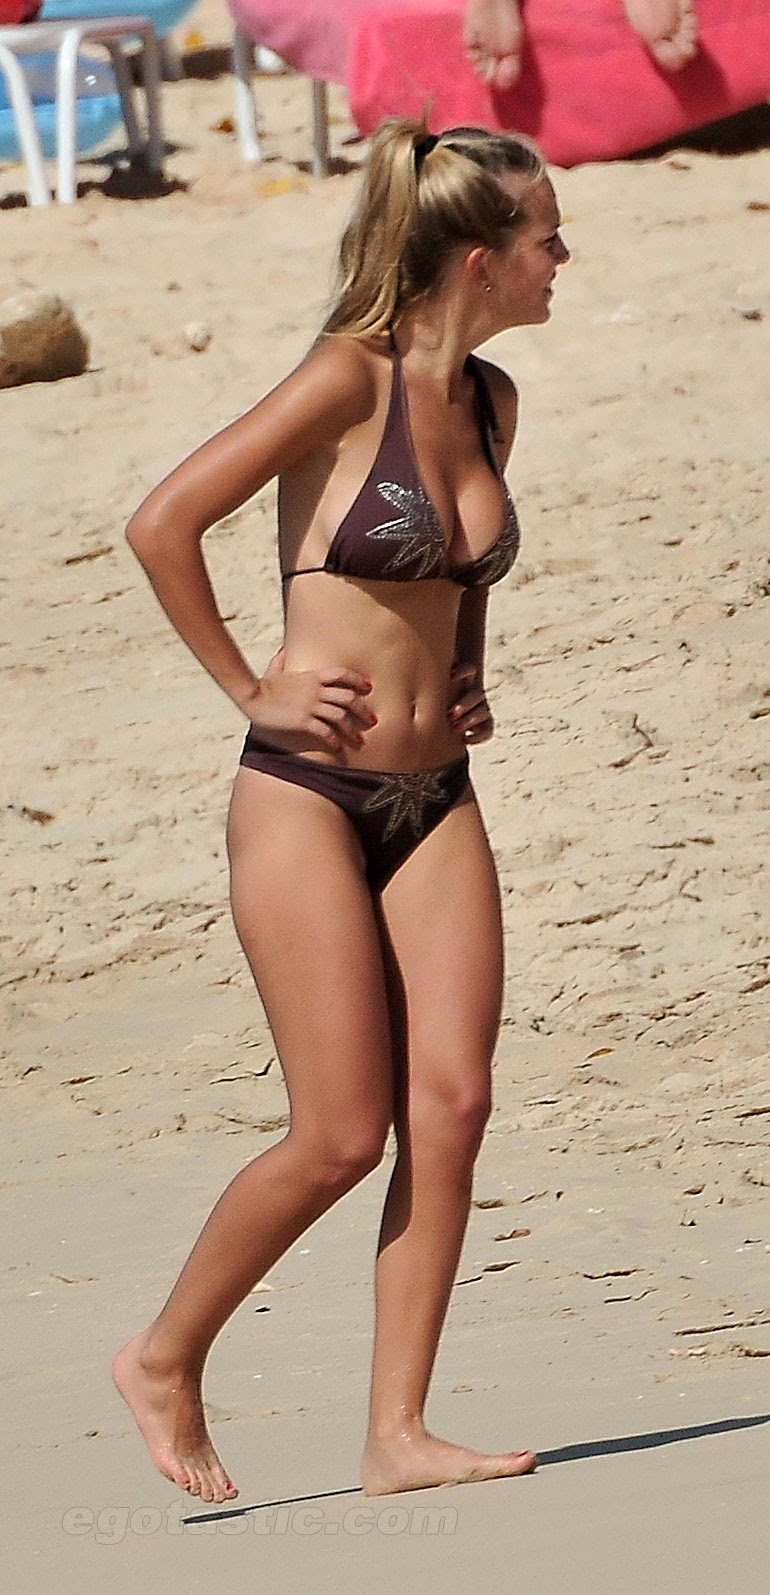 Bikini pics luisana lopilato commit error